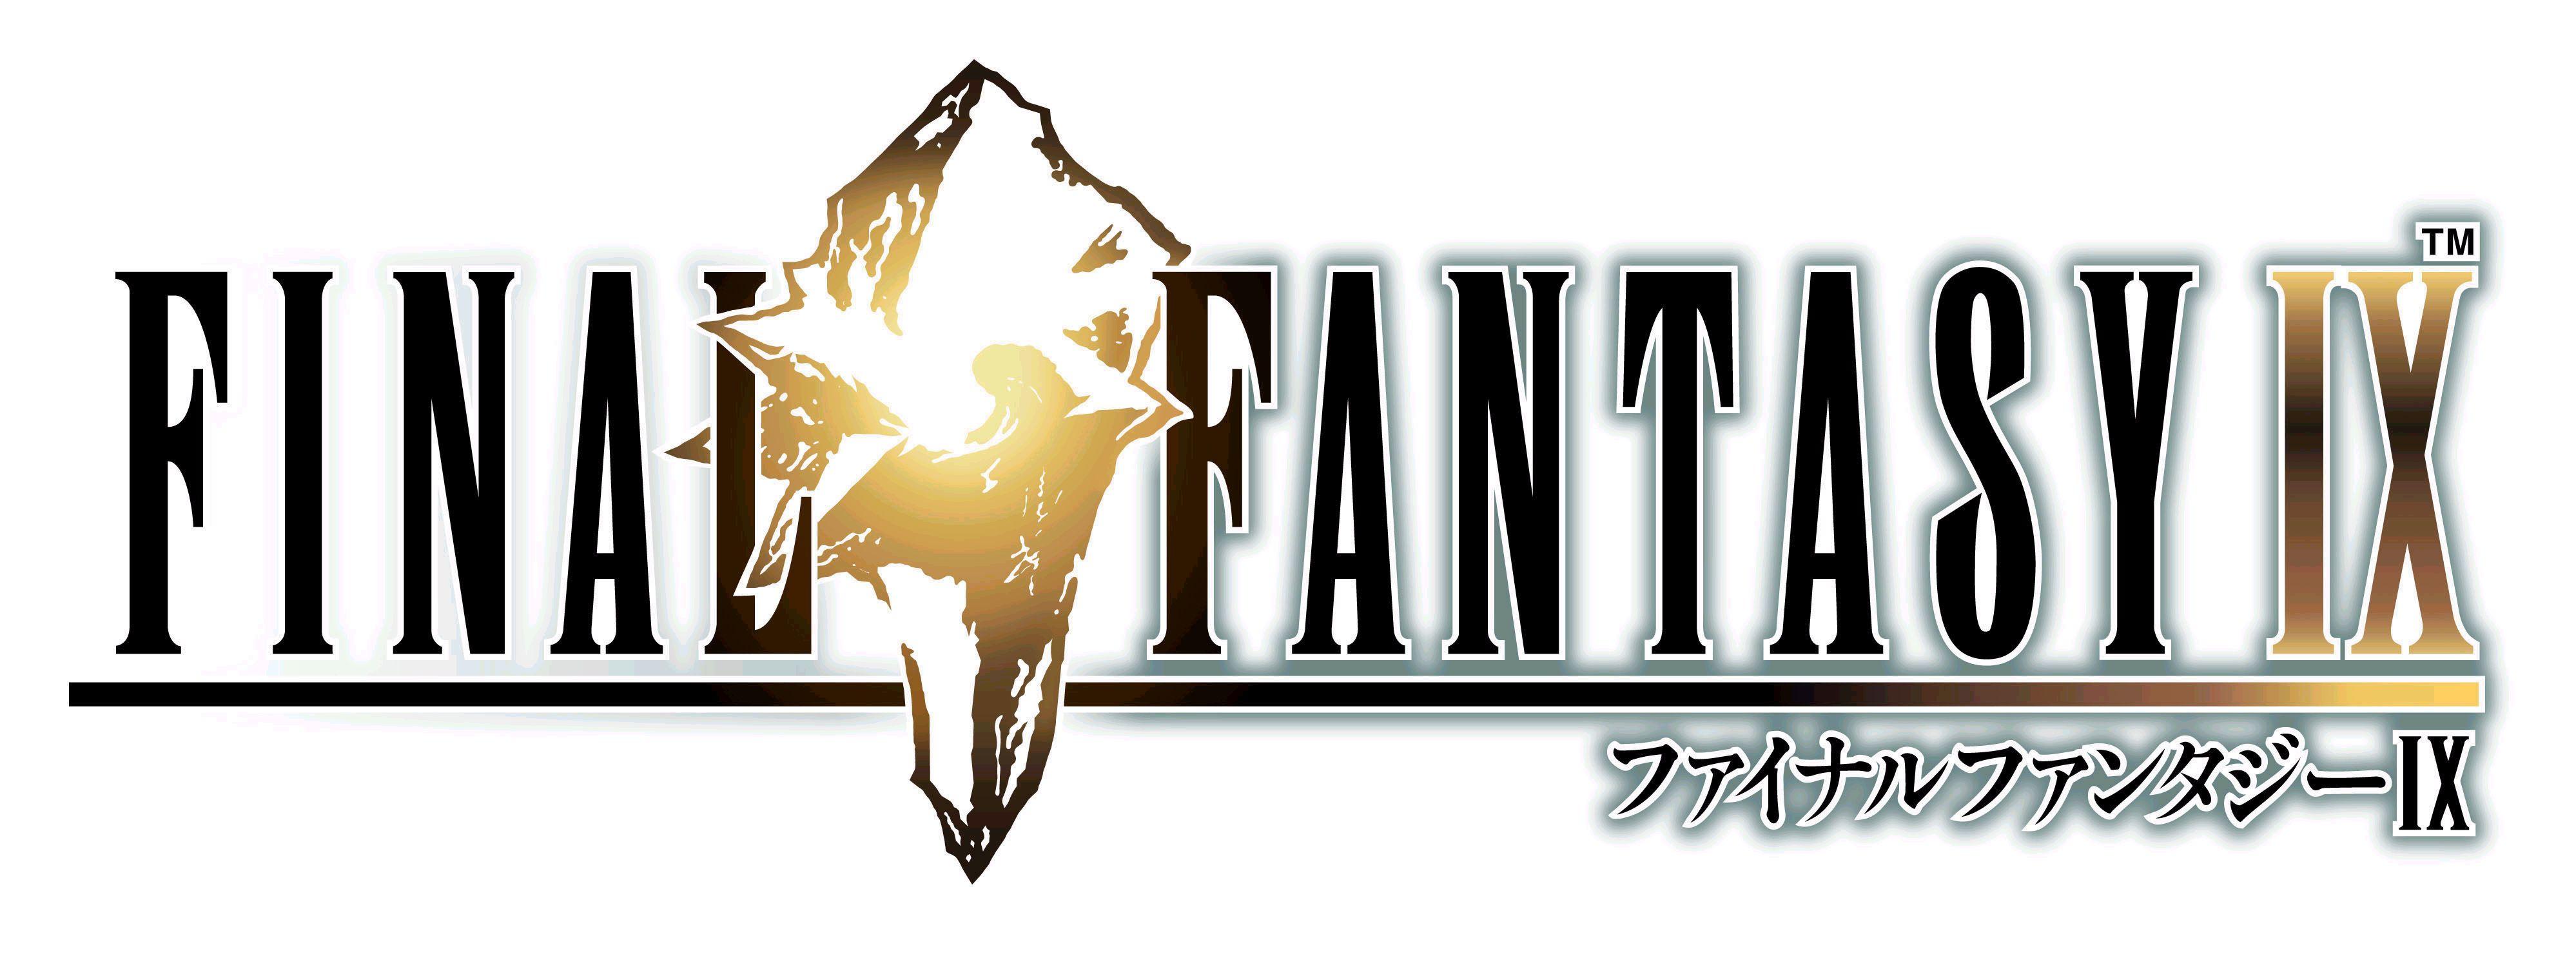 https://i2.wp.com/exp4all.net/wp-content/uploads/2016/01/09._final_fantasy_ix.jpg